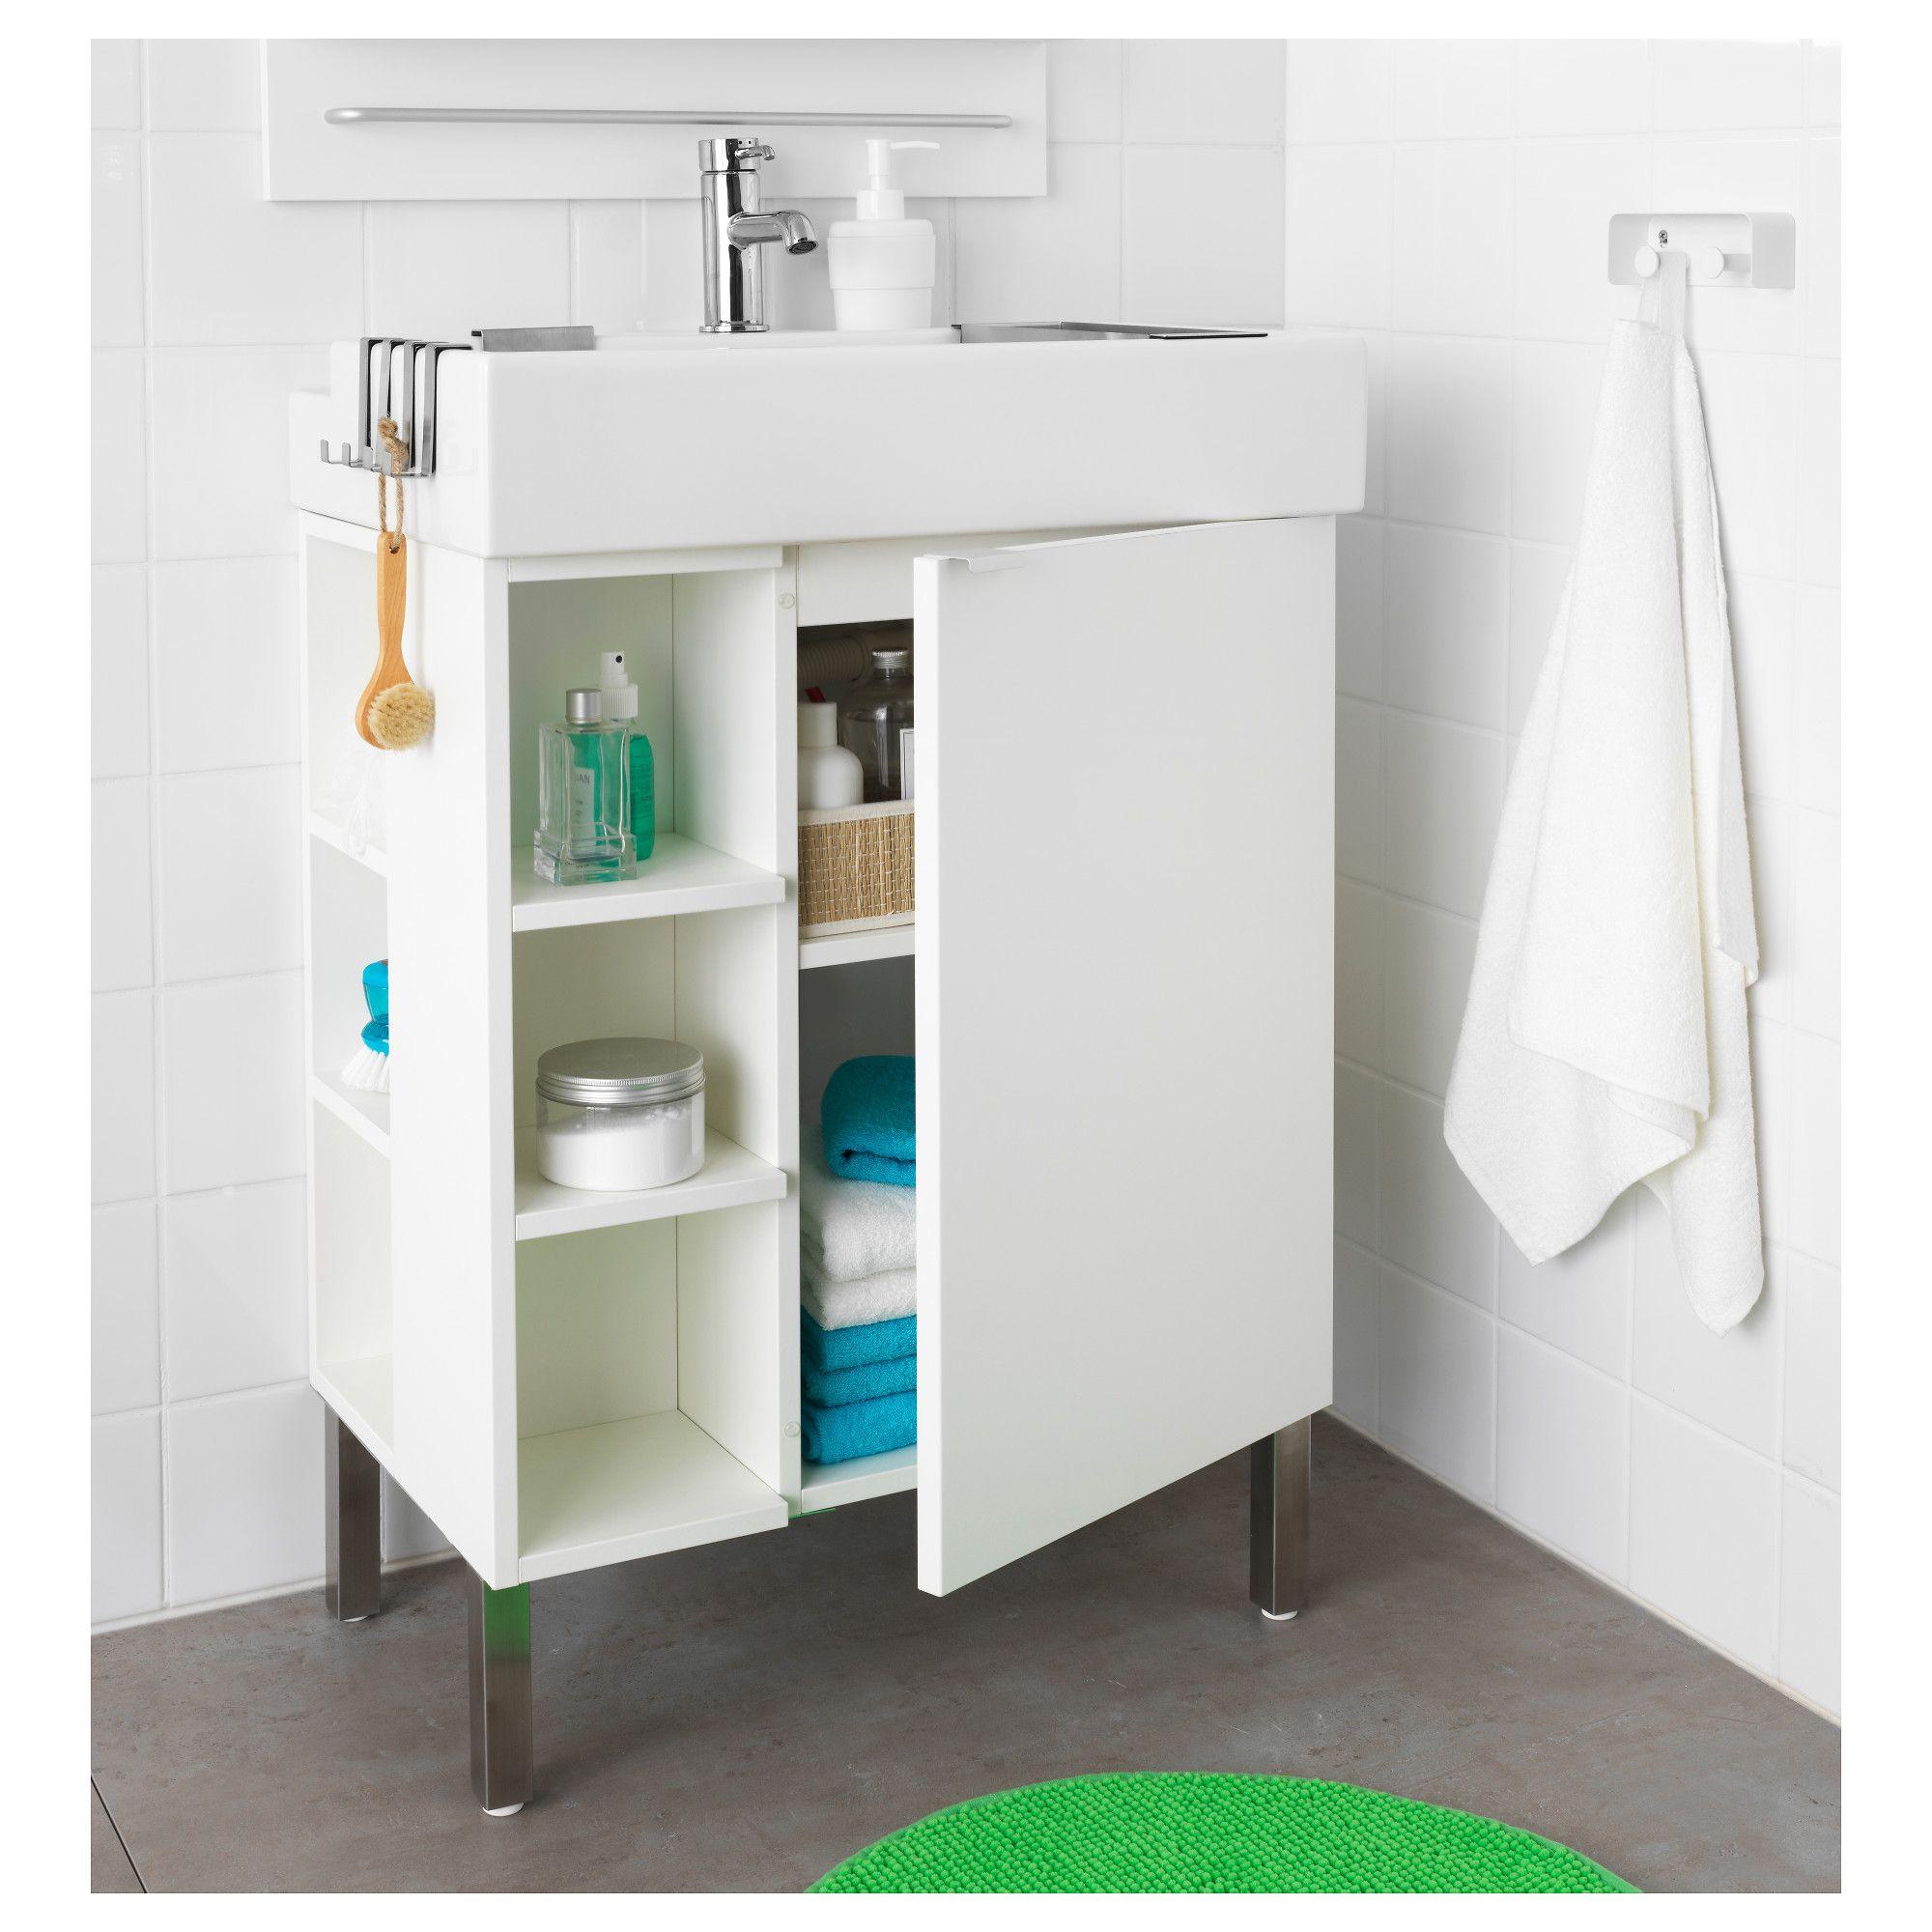 Furniture and Home Furnishings Ikea, Small bathroom,